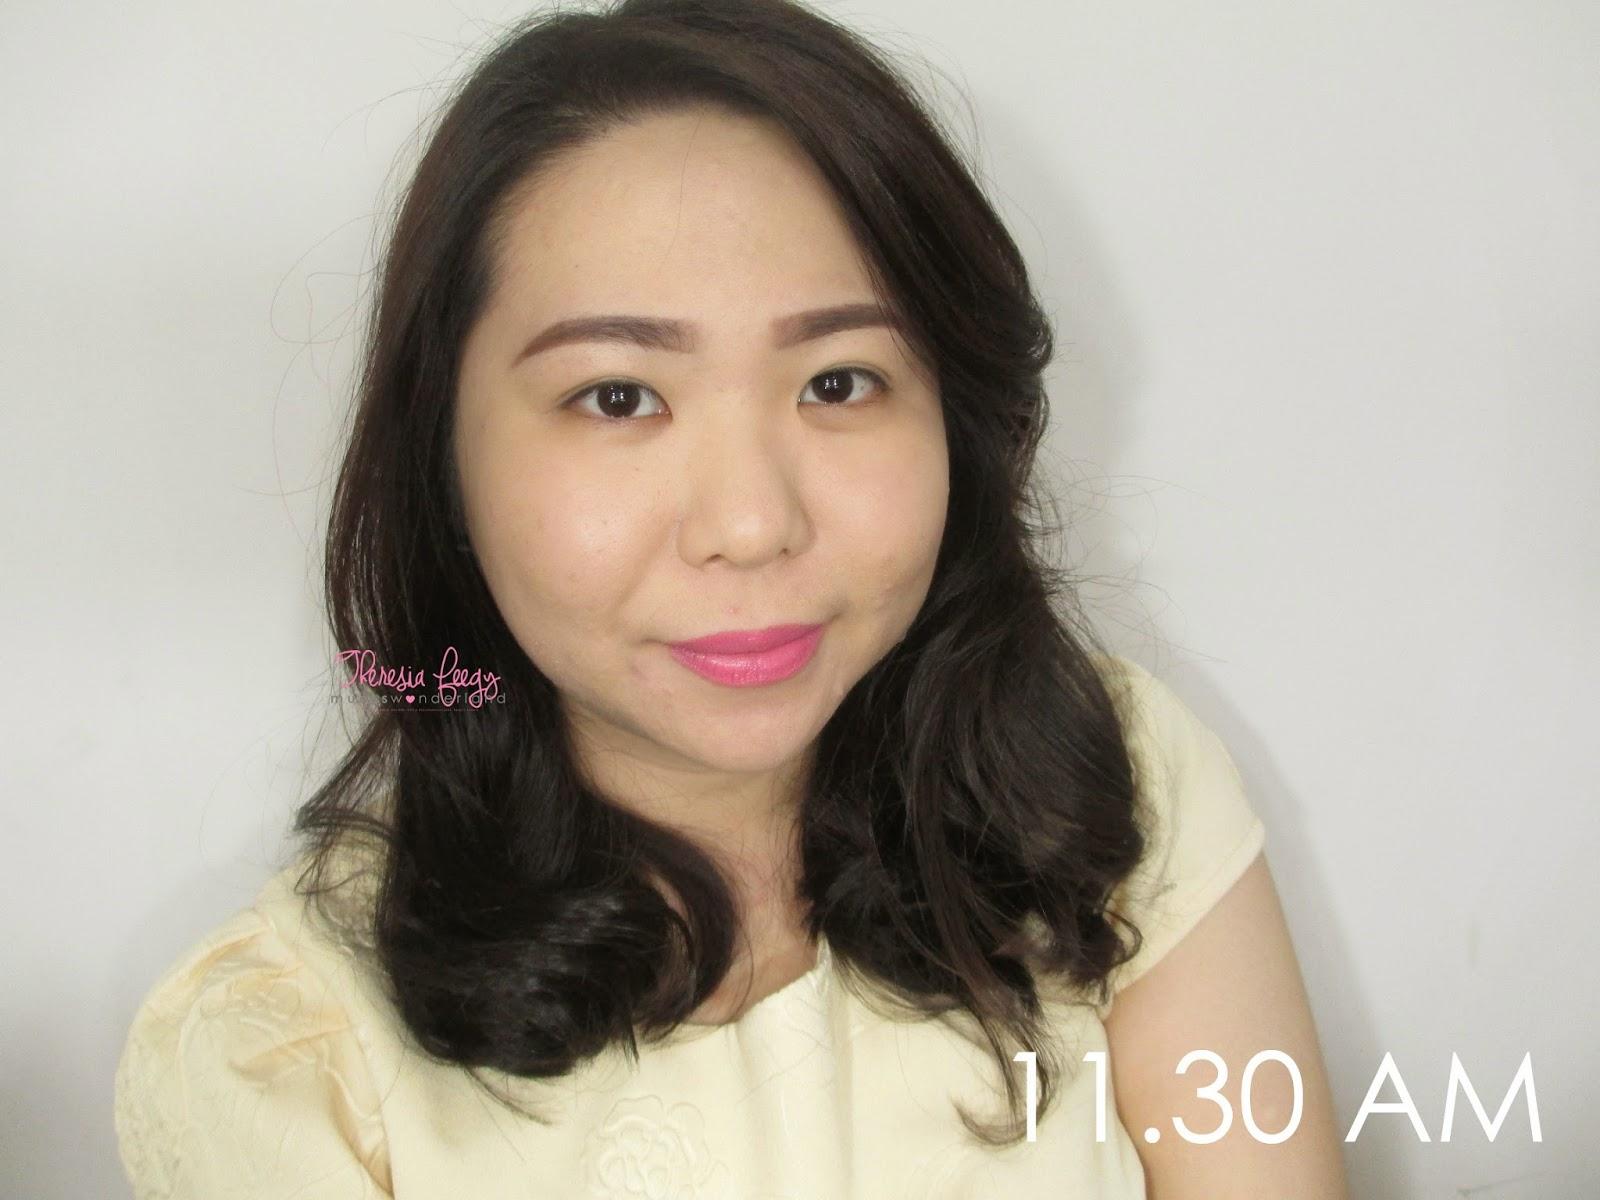 long lasting, doesnt slide away, light weight, medium-high coverage, korean, good for oily skin foundation